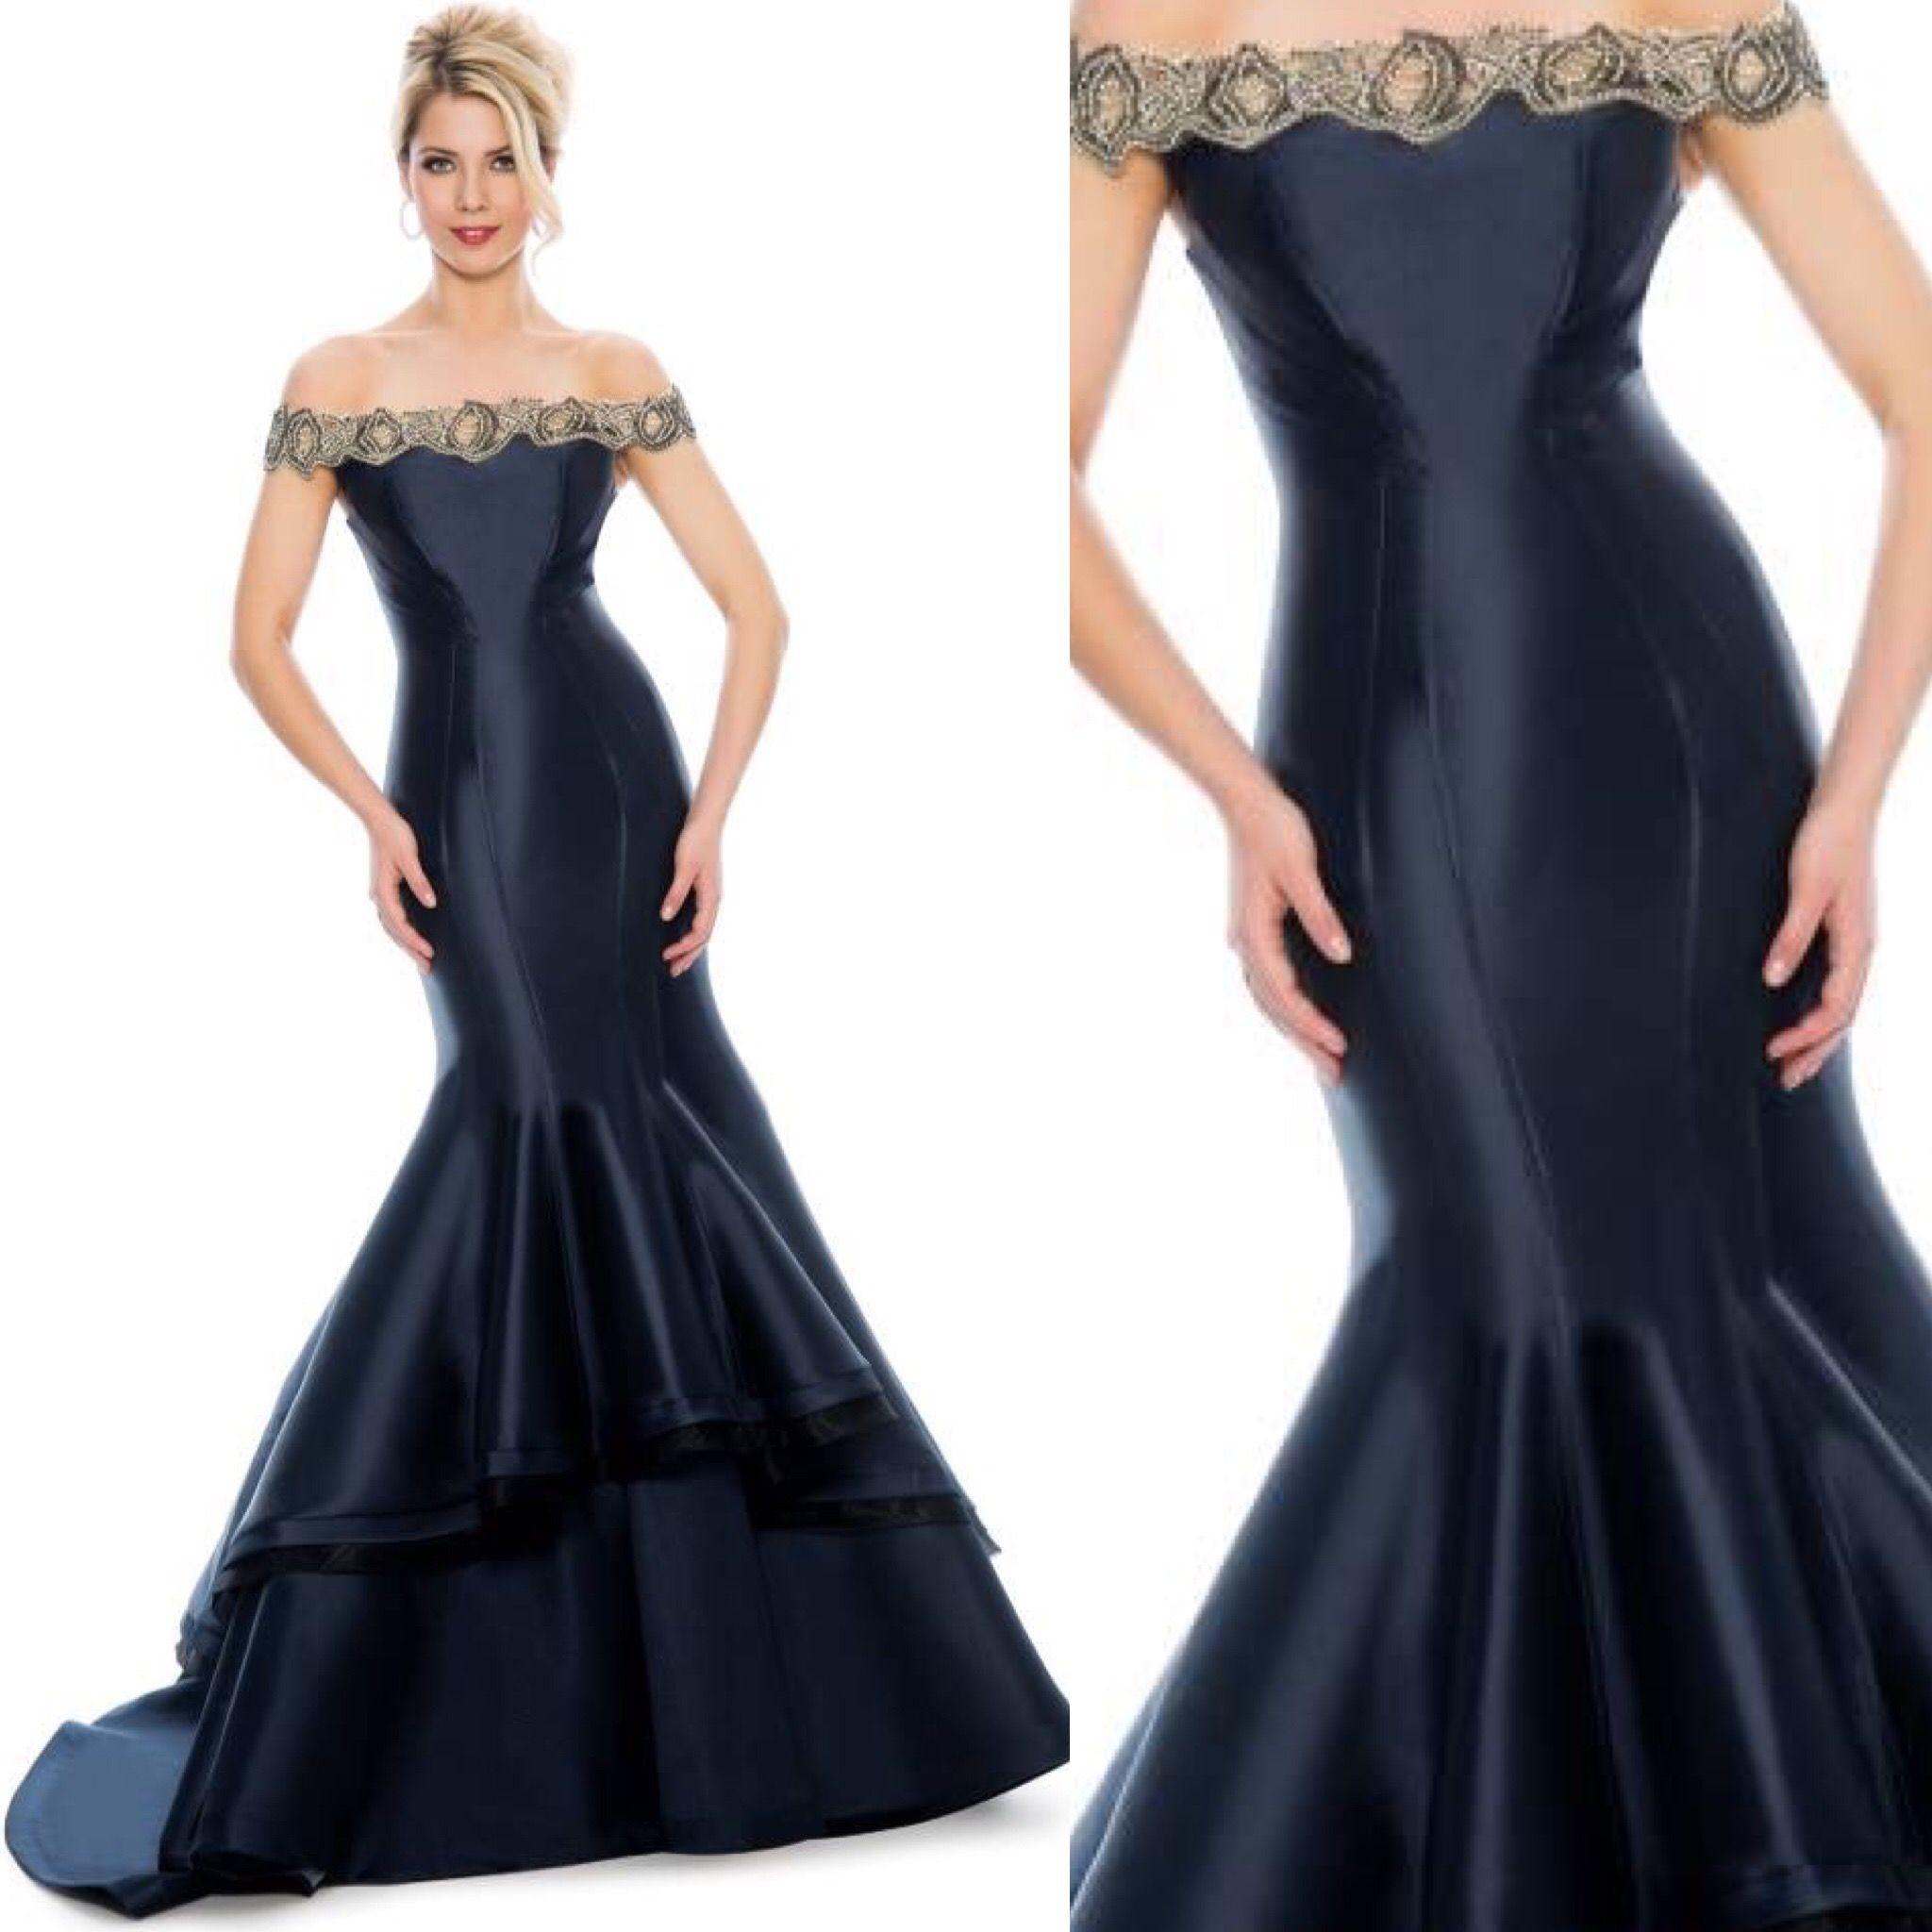 Gala Dinner Dresses Call 469 571 3647 Or Email Divasdenfashion